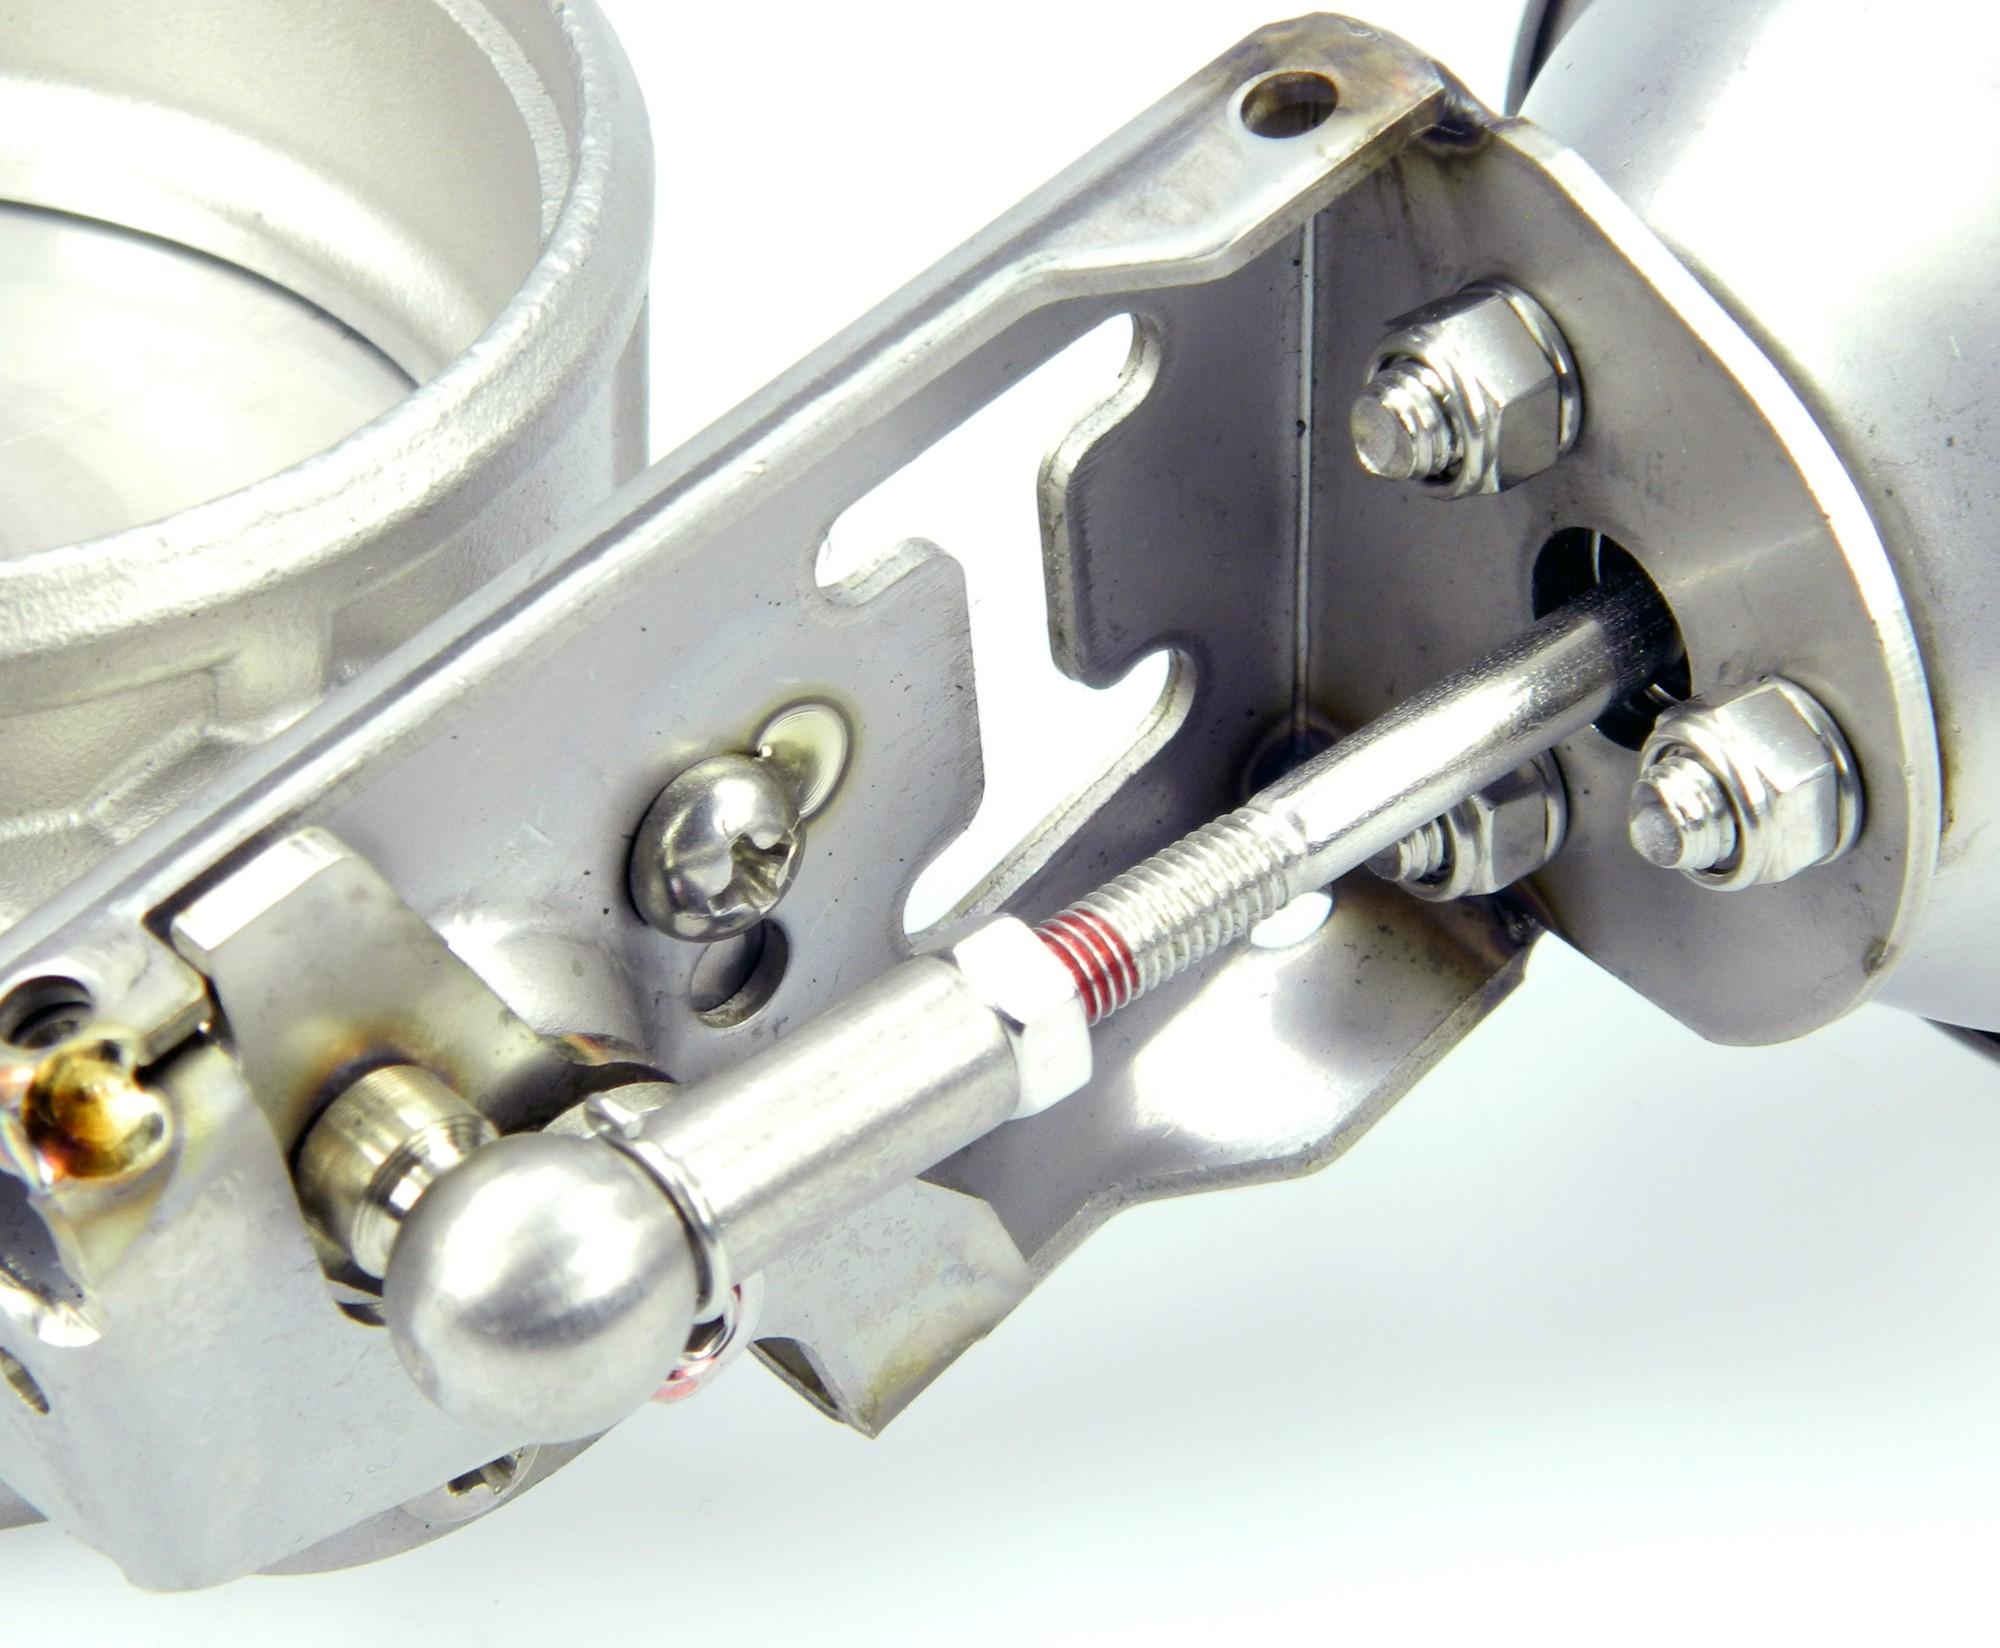 Auspuffklappe 76mm - Unterdruck gesteuert - Komplettsystem